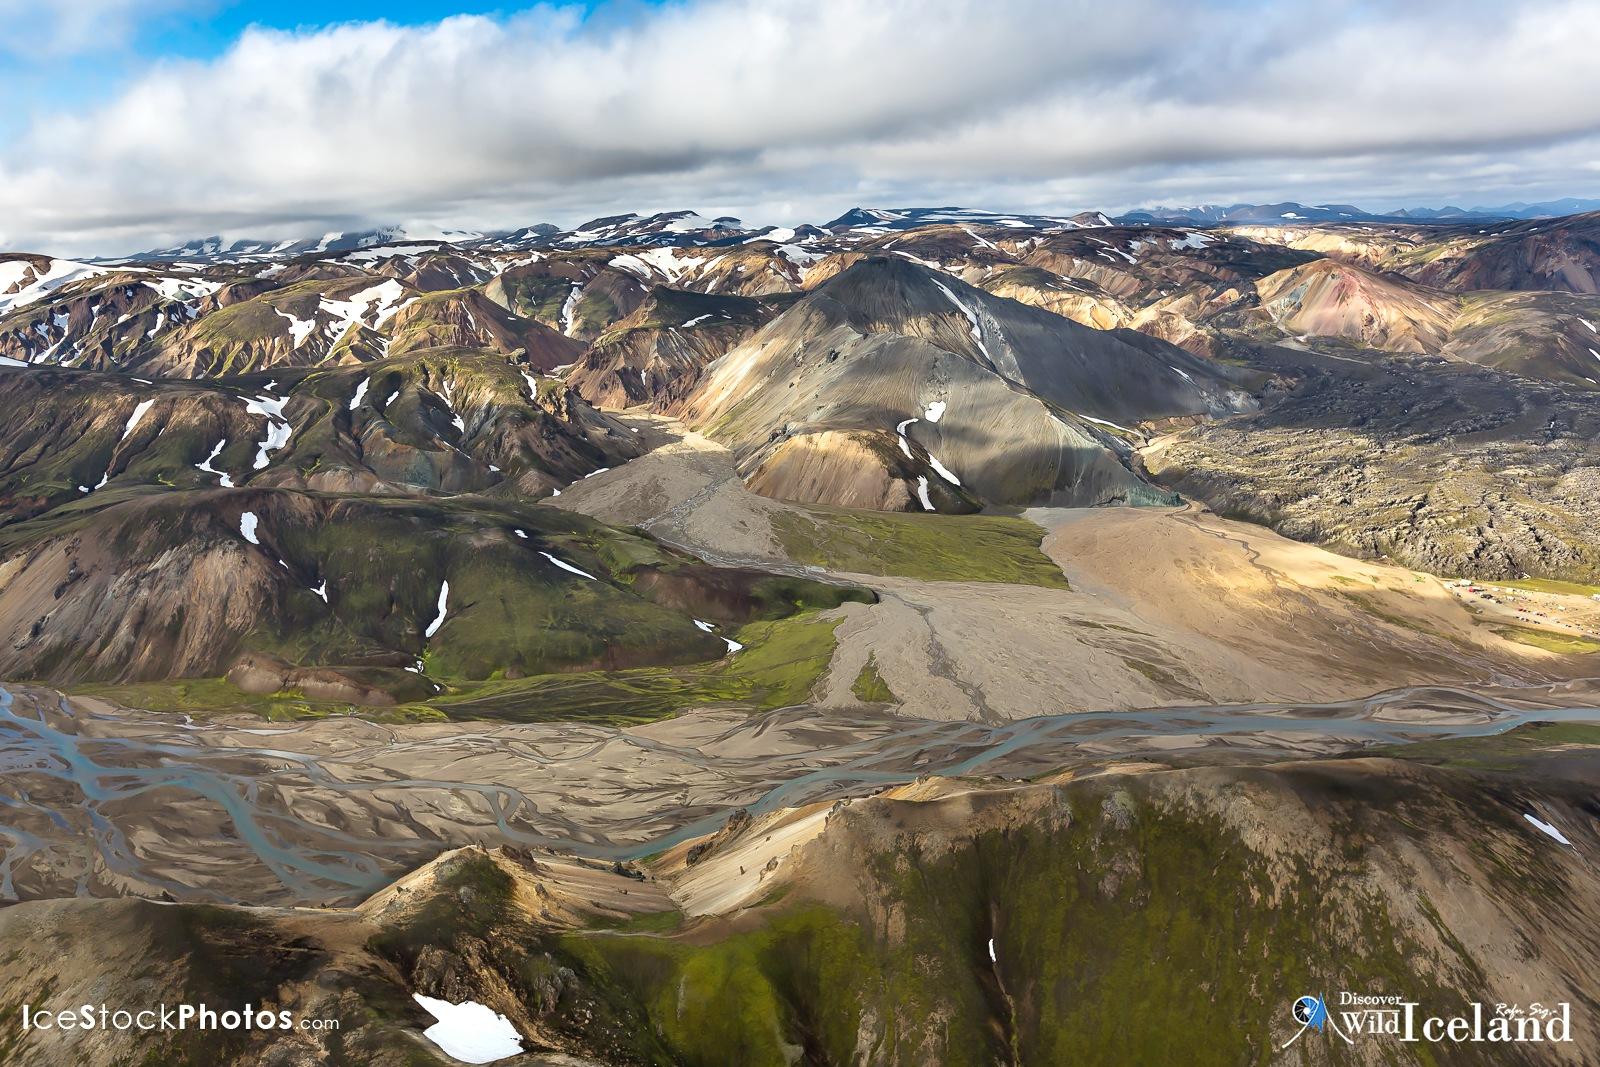 Discover Wild Iceland – Bláhnúkur Mountain in the Highlands of Landmannalaugar by Rafn Sig,-  @ Discover Wild Iceland.com